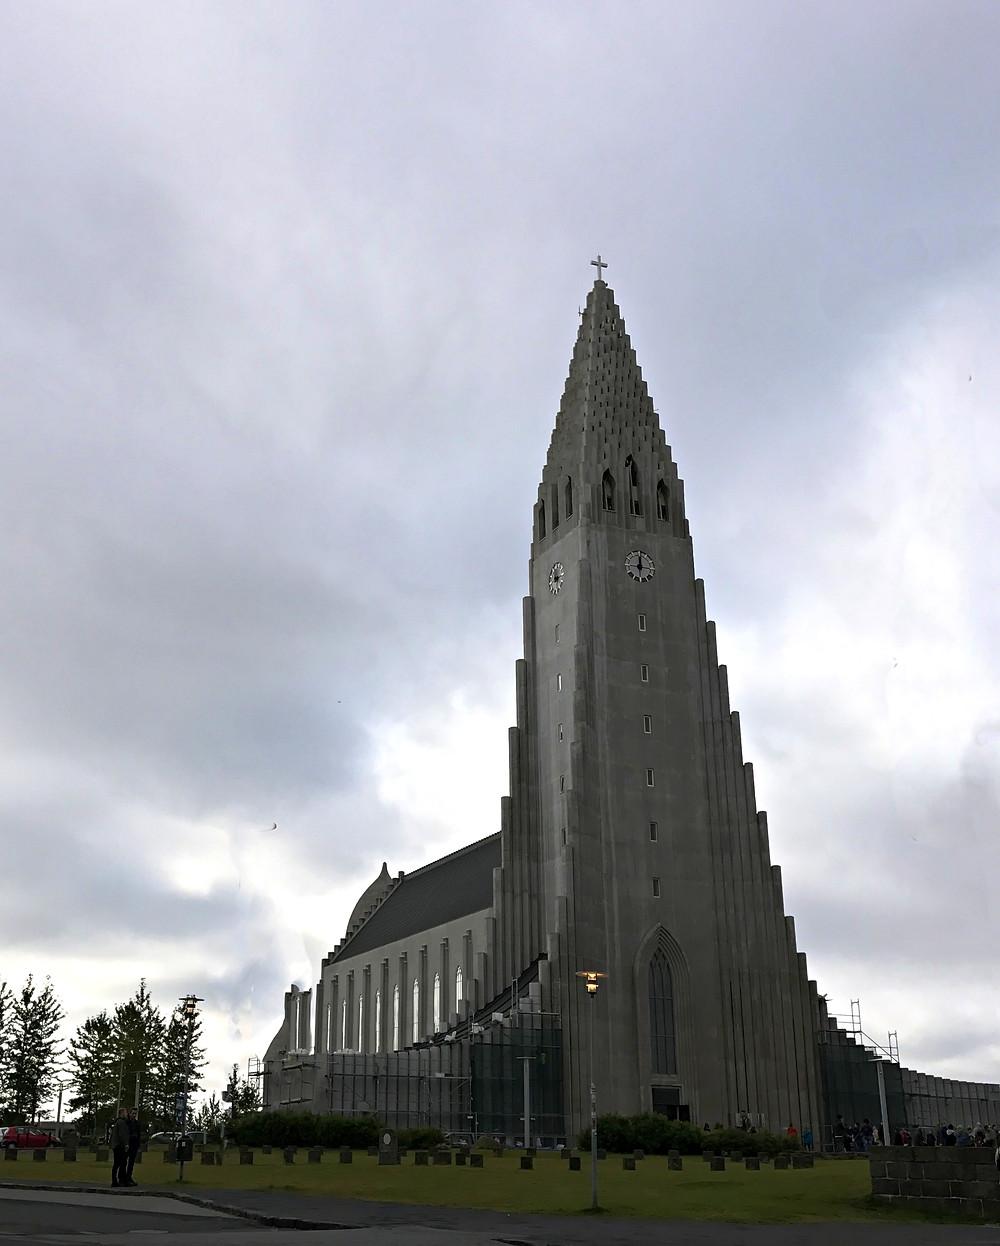 Iceland top spots: Hallgrimskirkja